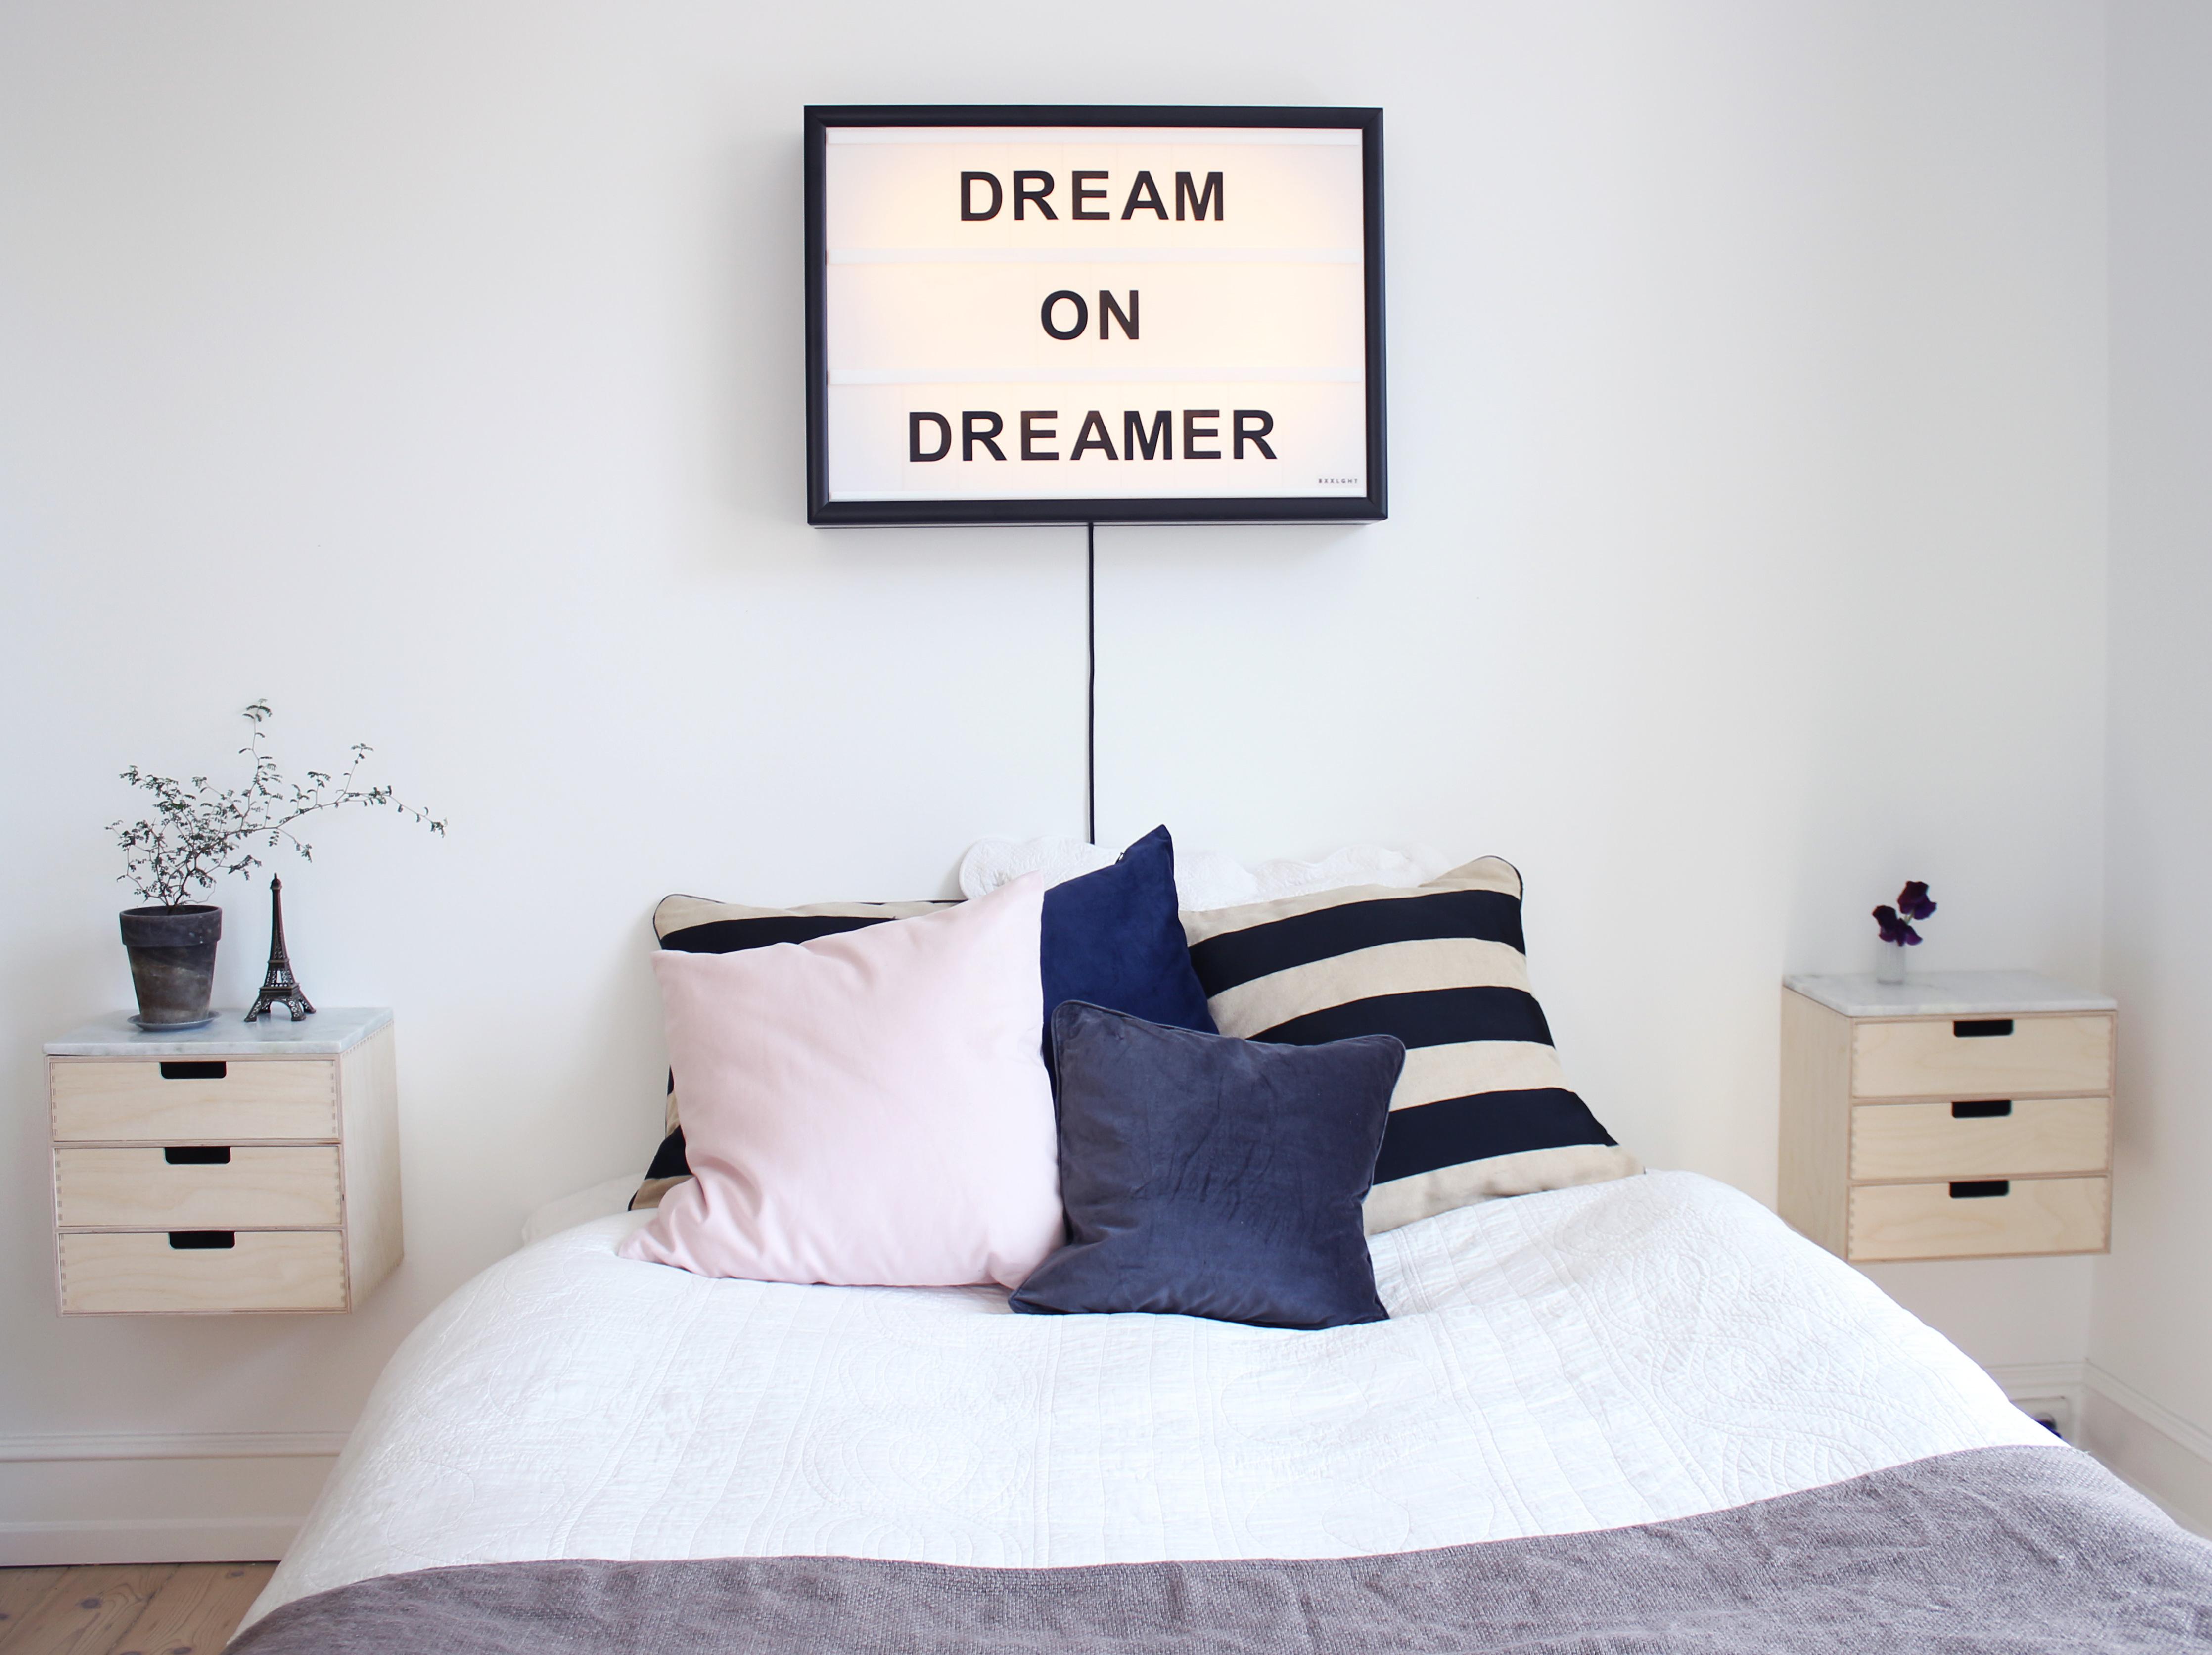 dream-on-dreamer-bxxlght@2x